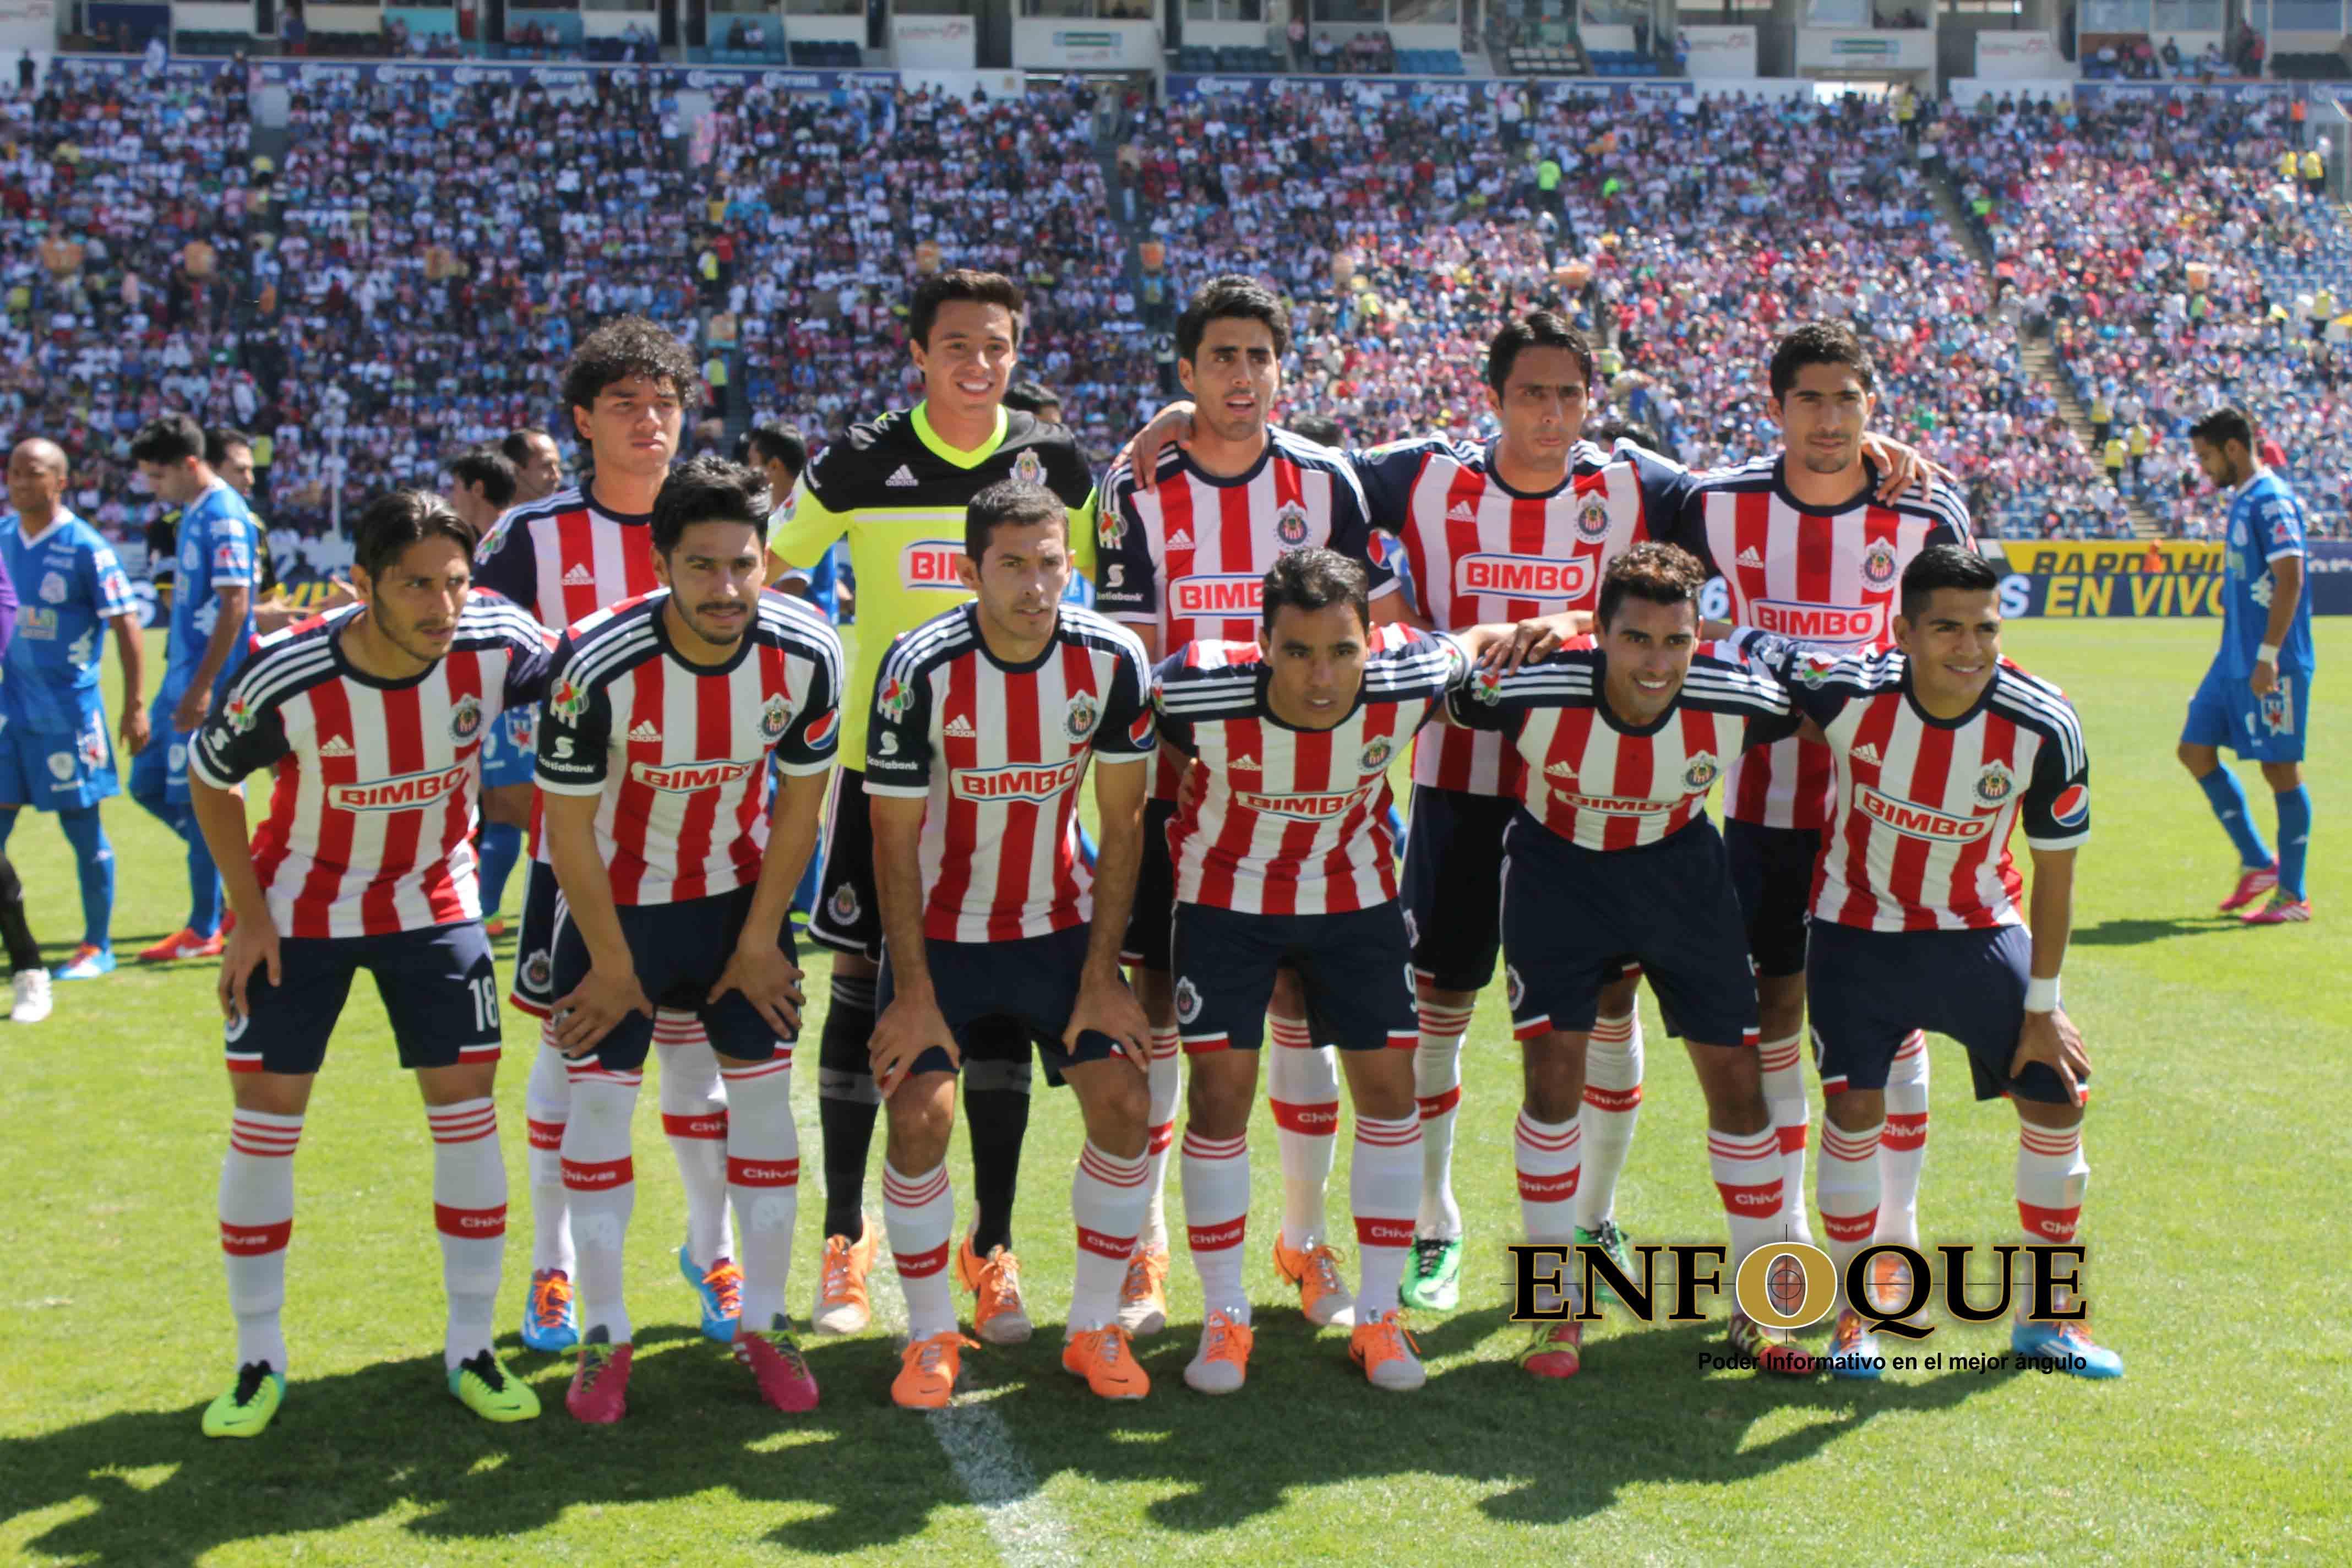 Club Deportivo Guadalajara - Wikipedia, la enciclopedia libre